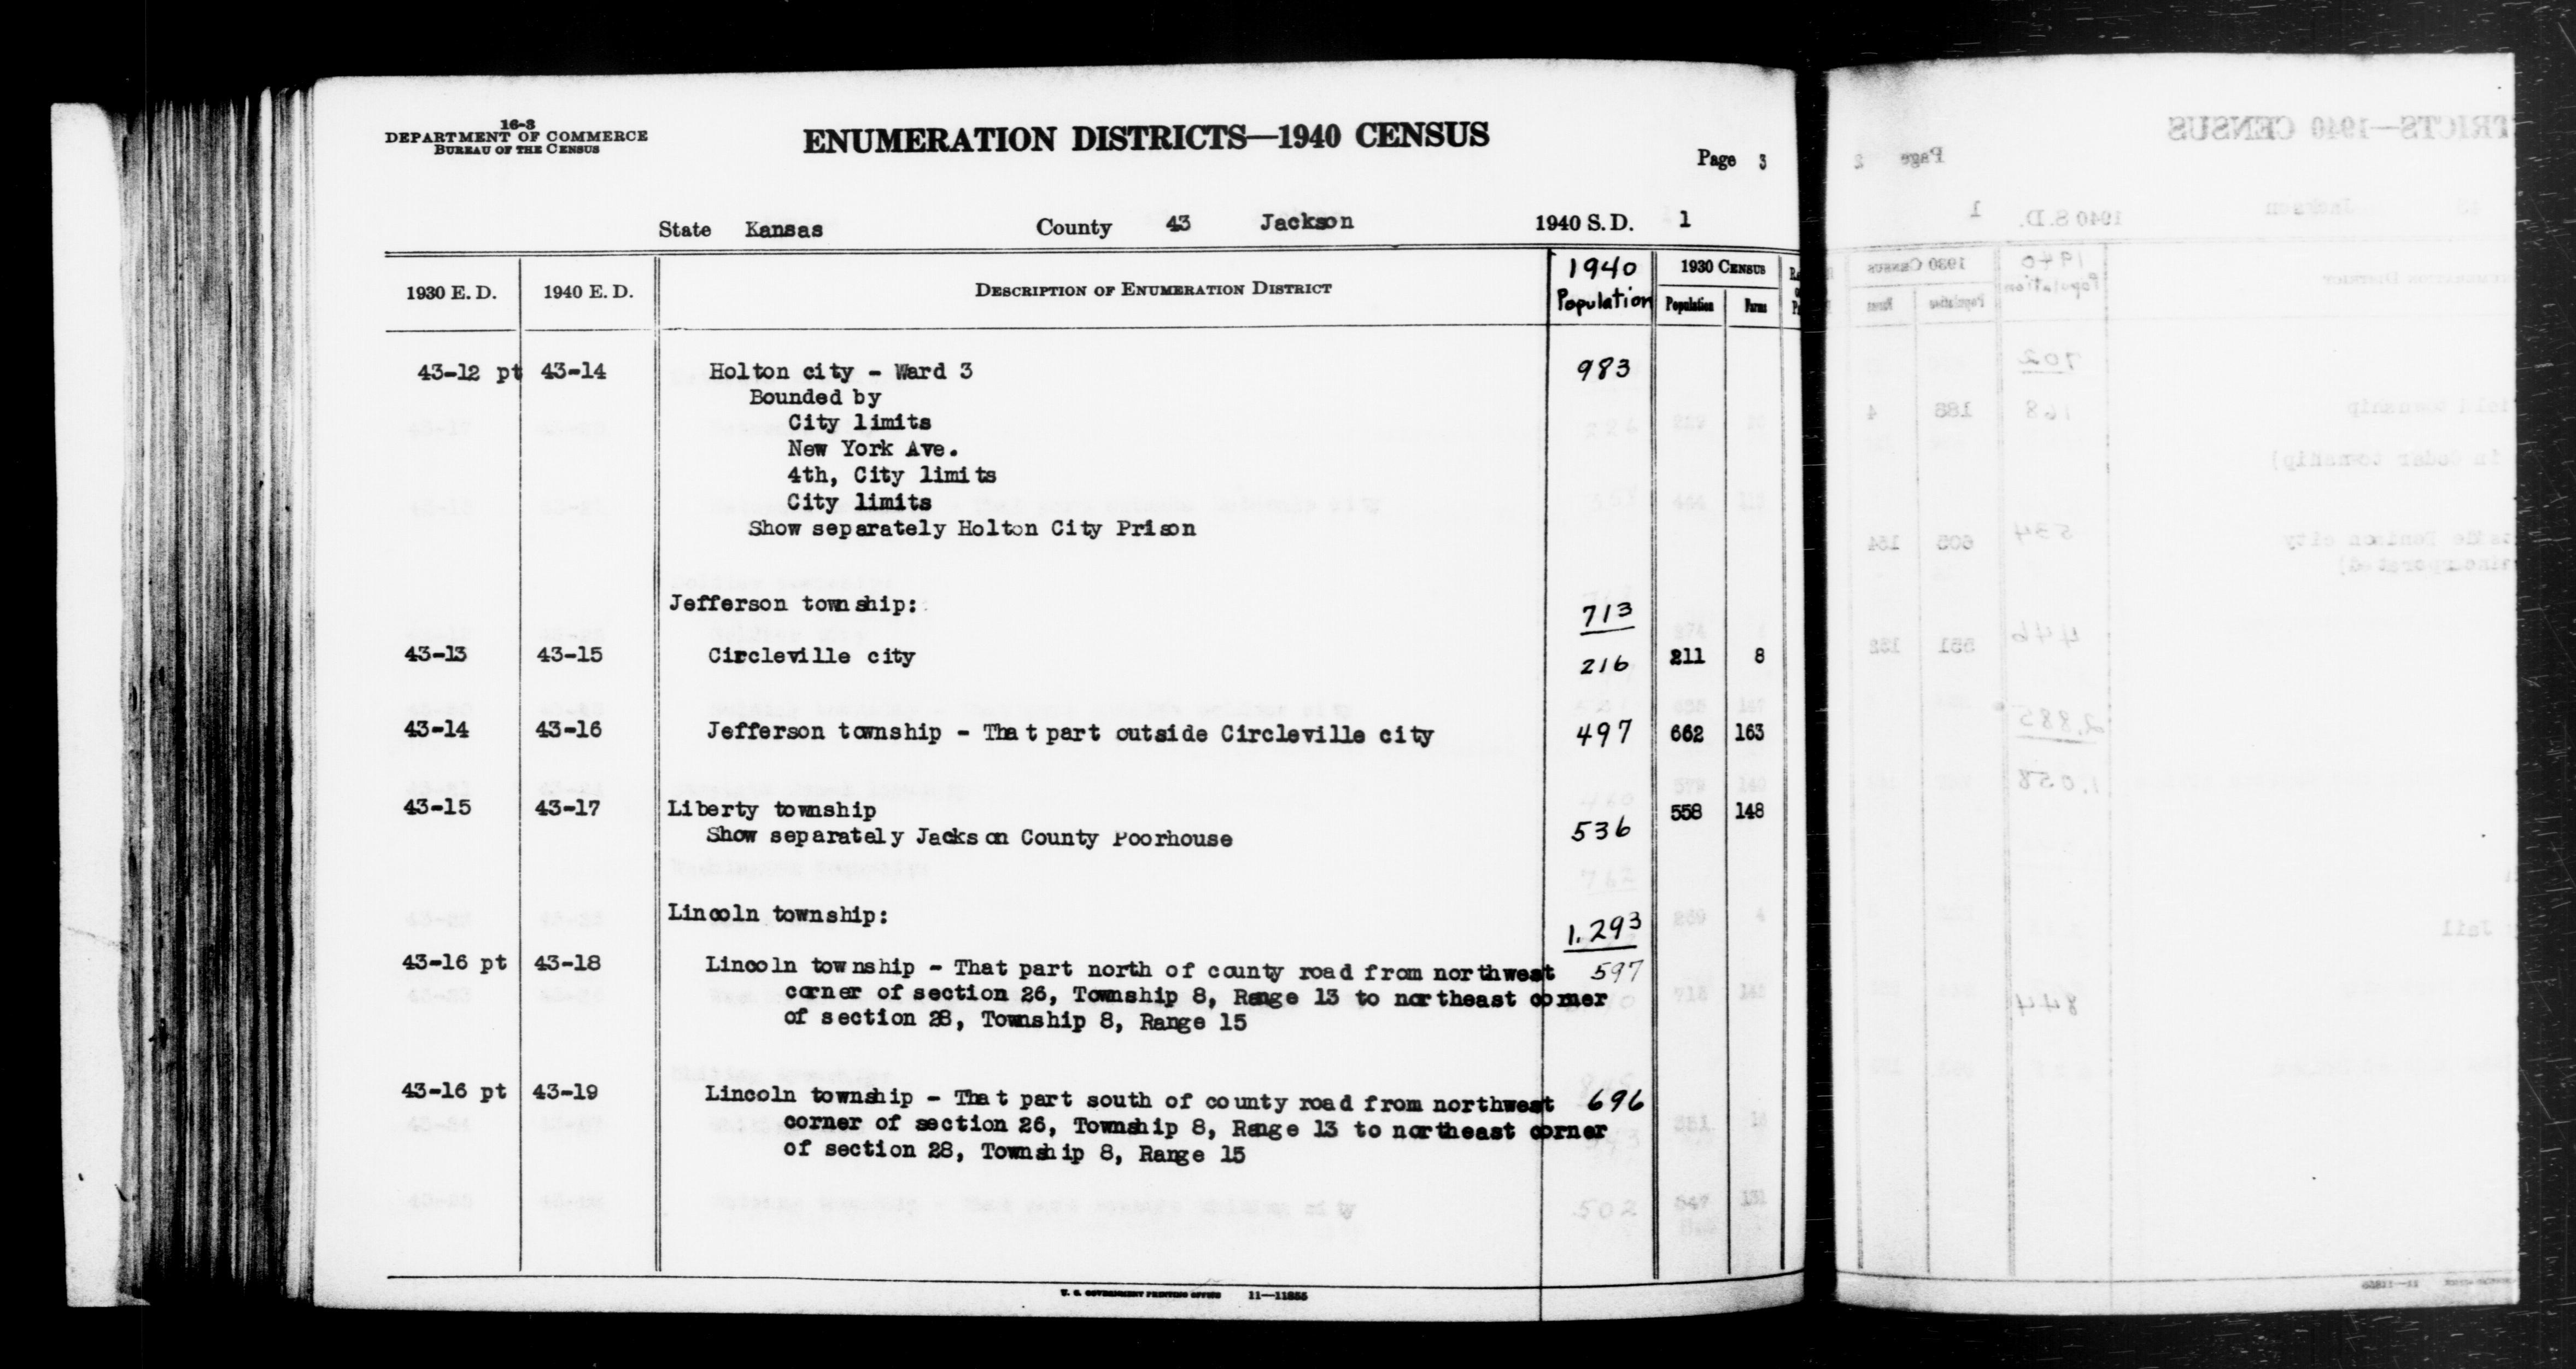 1940 Census Enumeration District Descriptions - Kansas - Jackson County - ED 43-14, ED 43-15, ED 43-16, ED 43-17, ED 43-18, ED 43-19